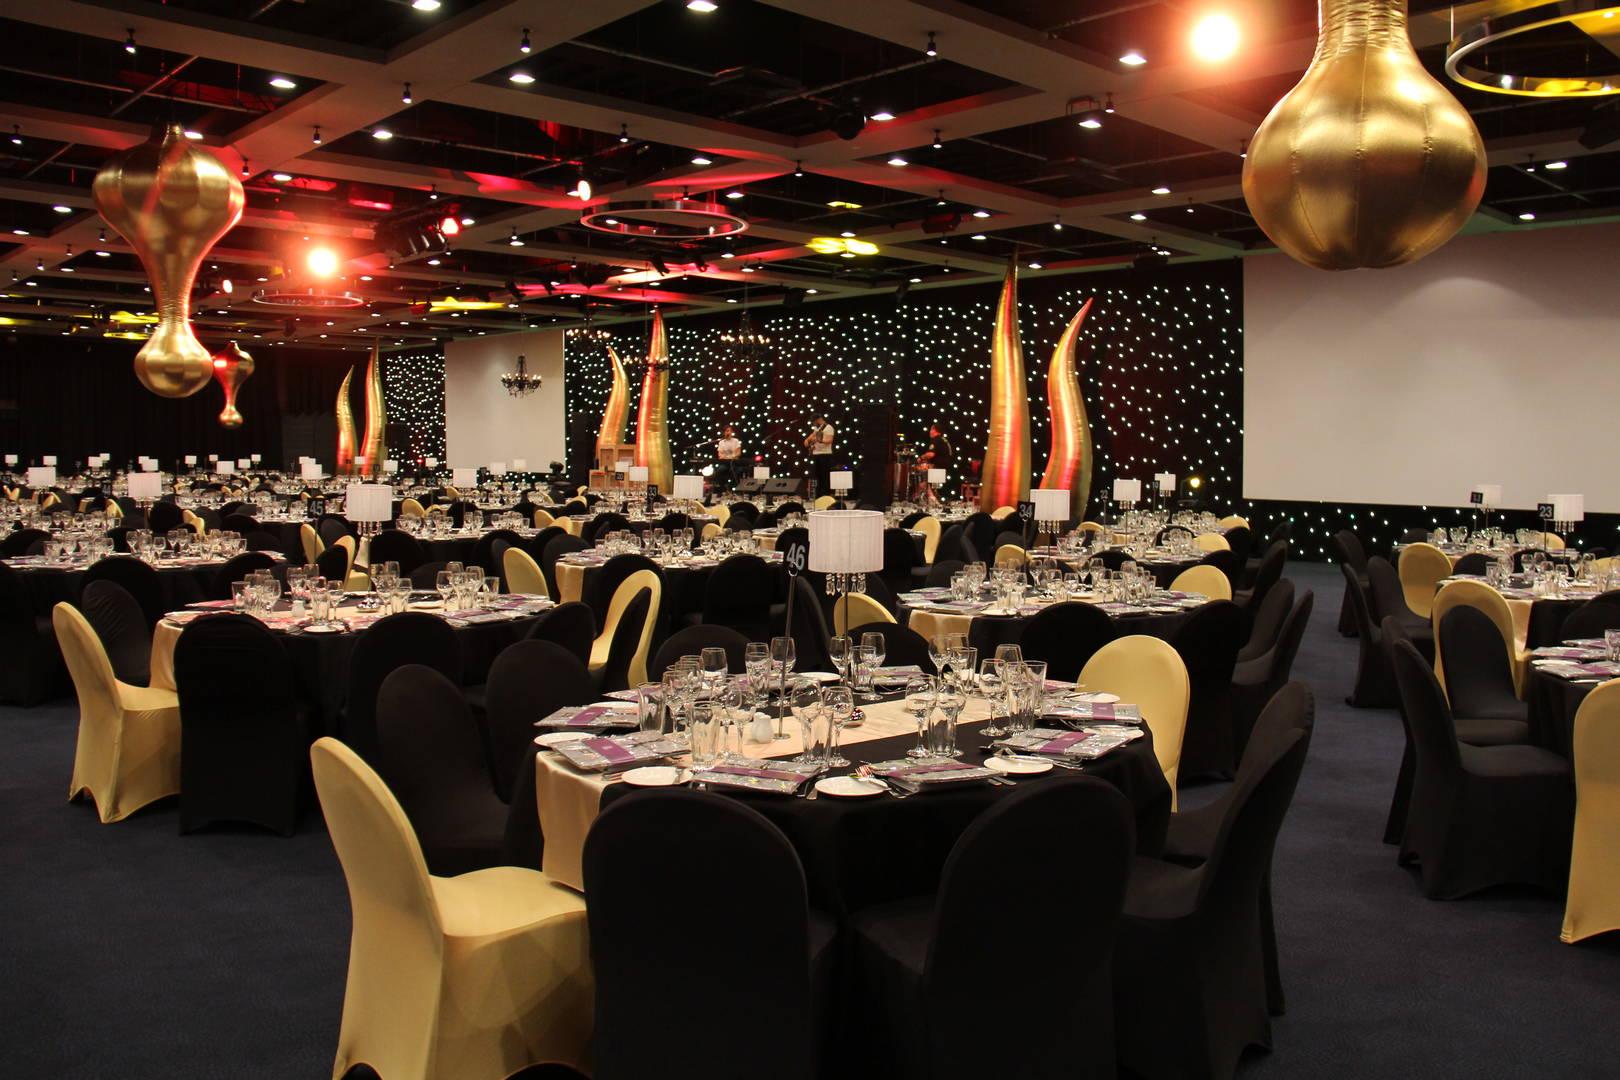 Grand Foyer Qudos : Grand ballroom at qudos bank arena sydney olympic park